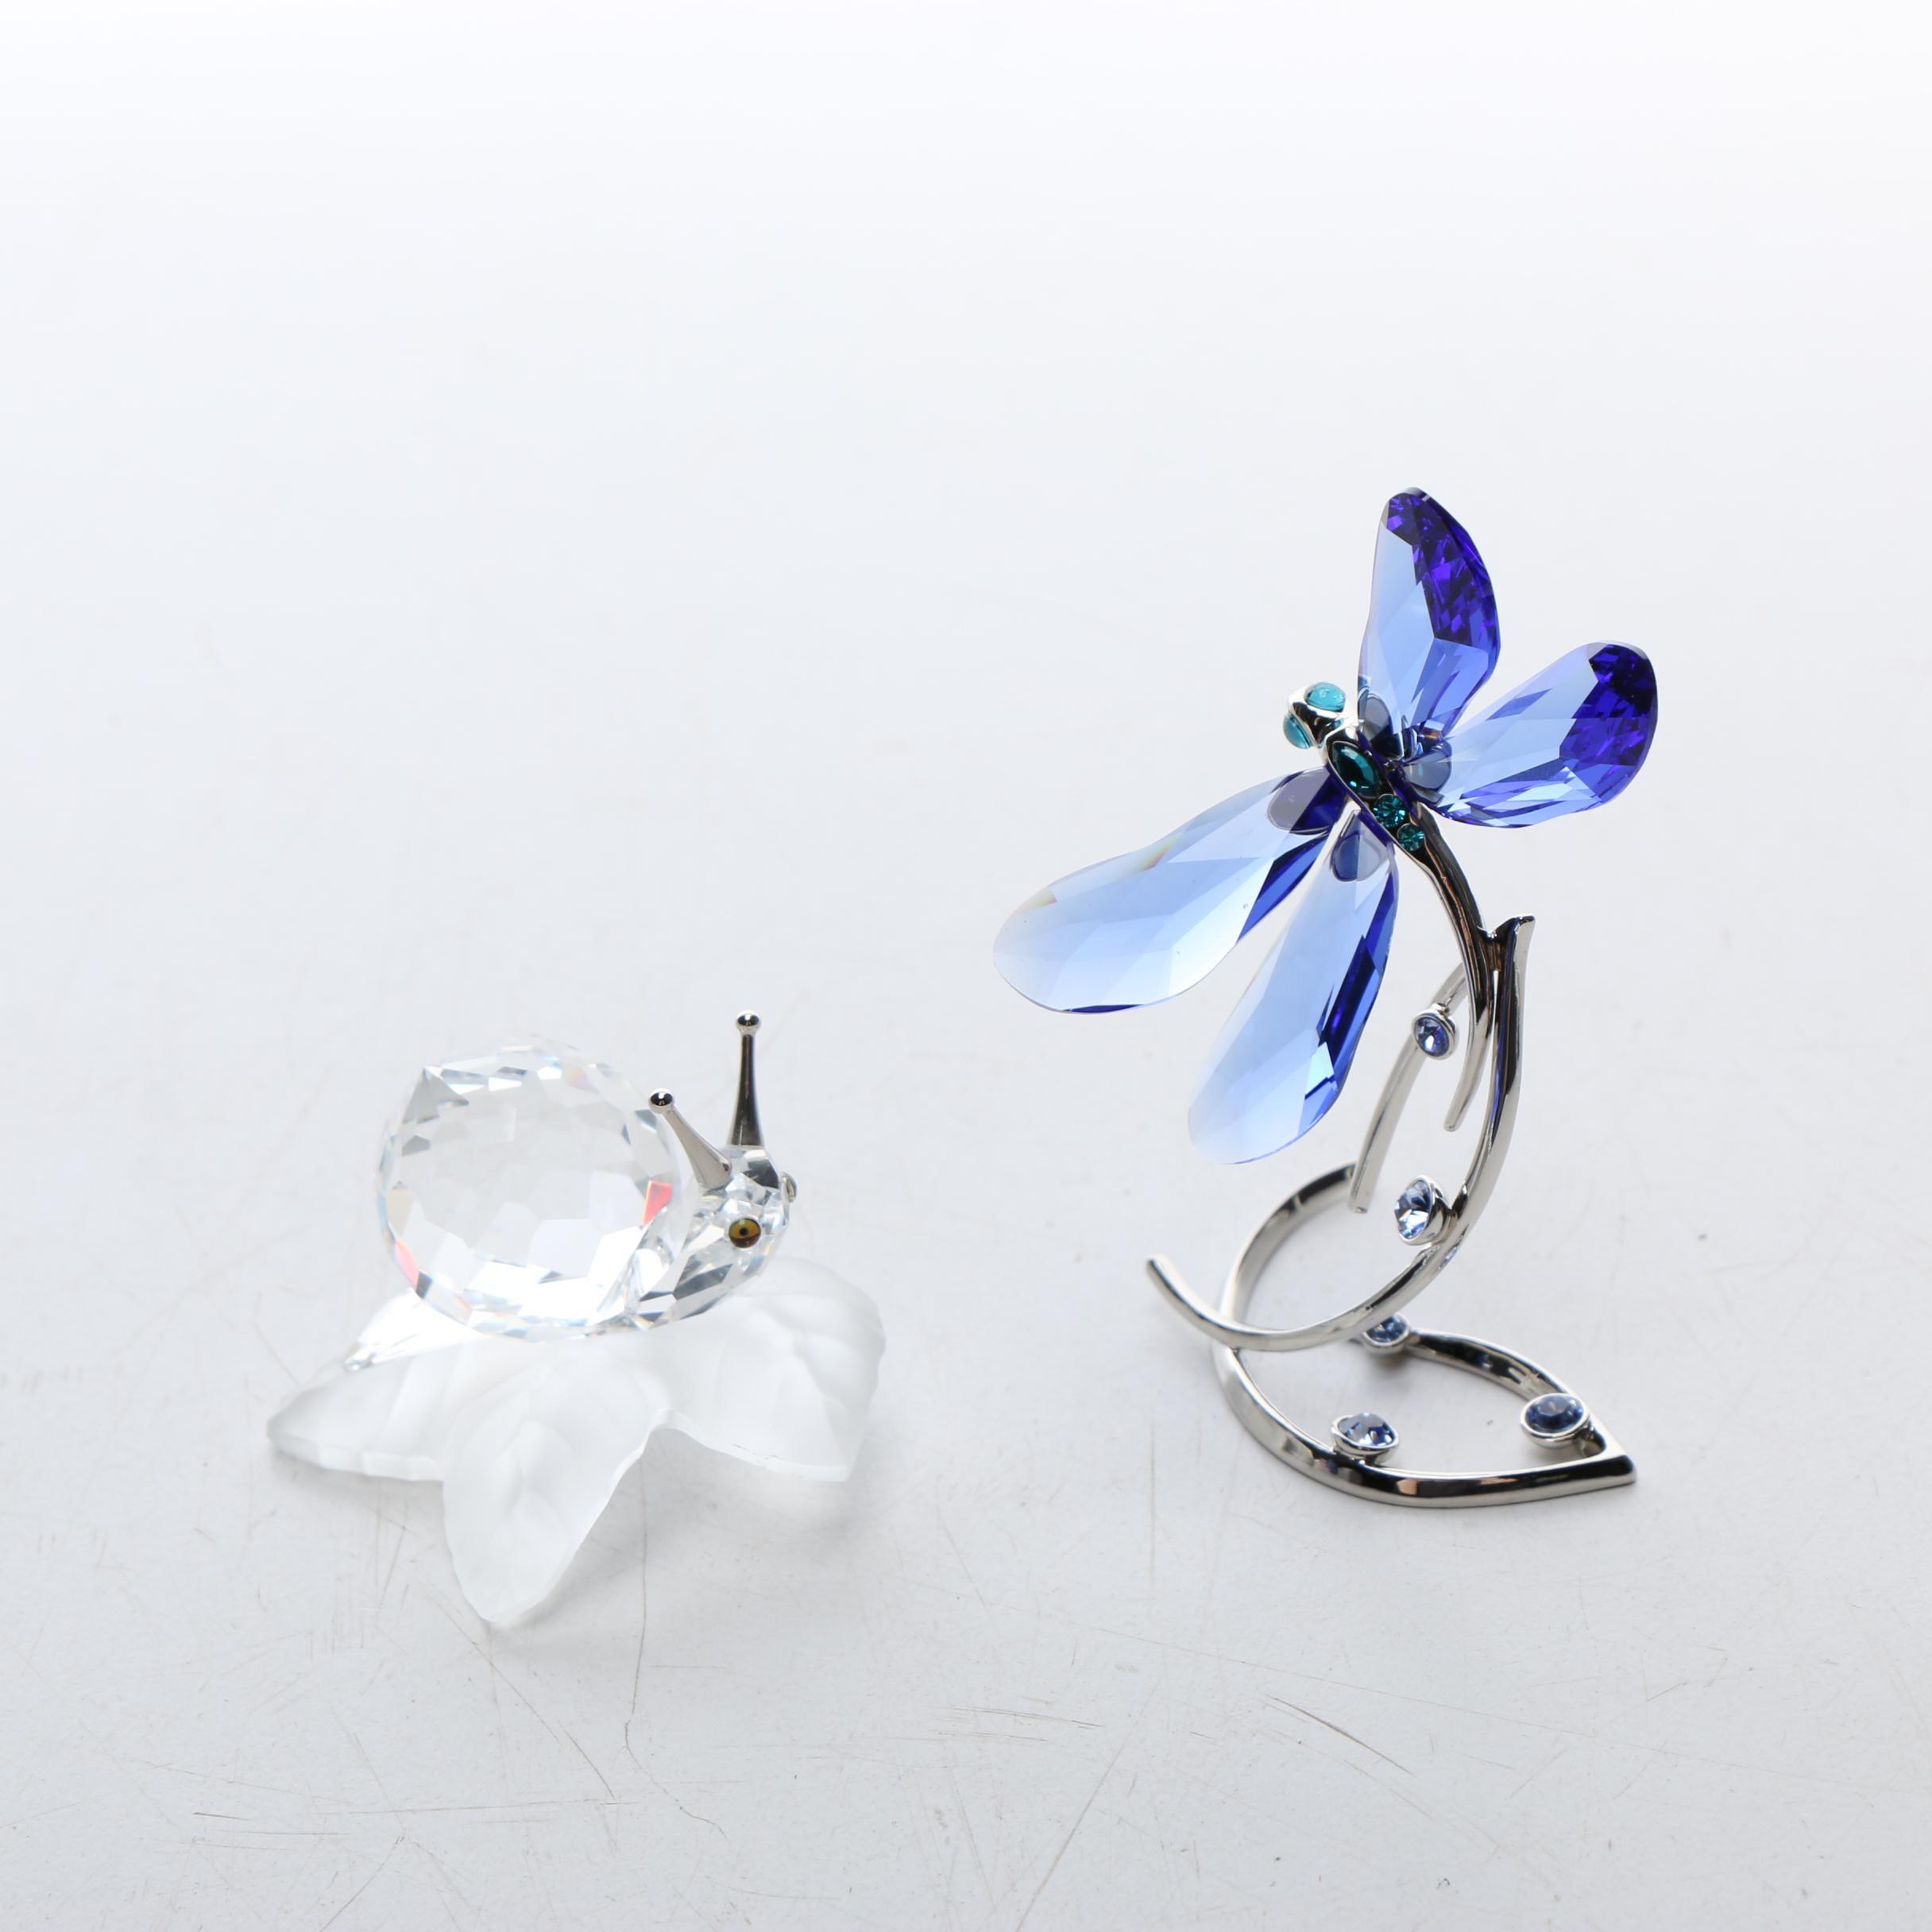 Swarovski Crystal Snail and Dragonfly Figurine